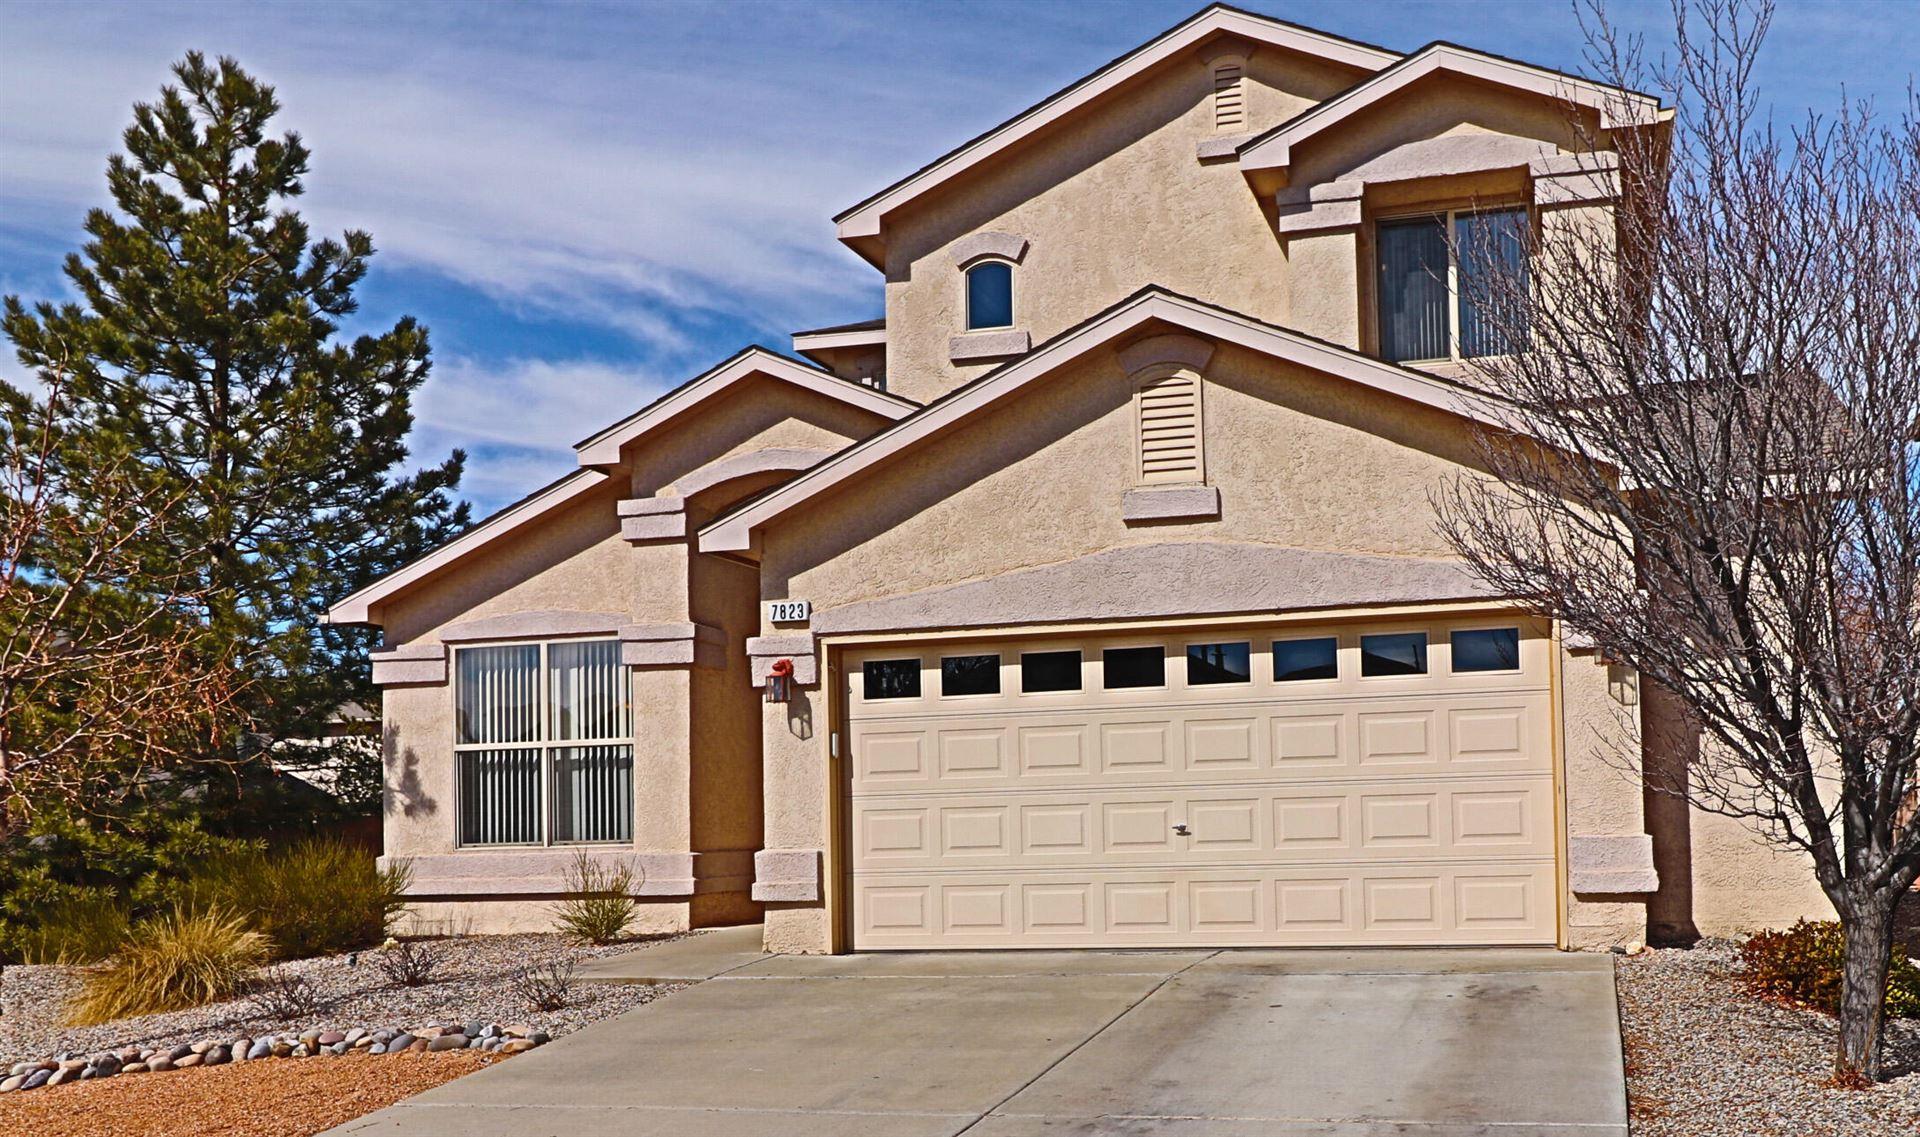 7823 Seven Springs Road NW, Albuquerque, NM 87114 - MLS#: 986858